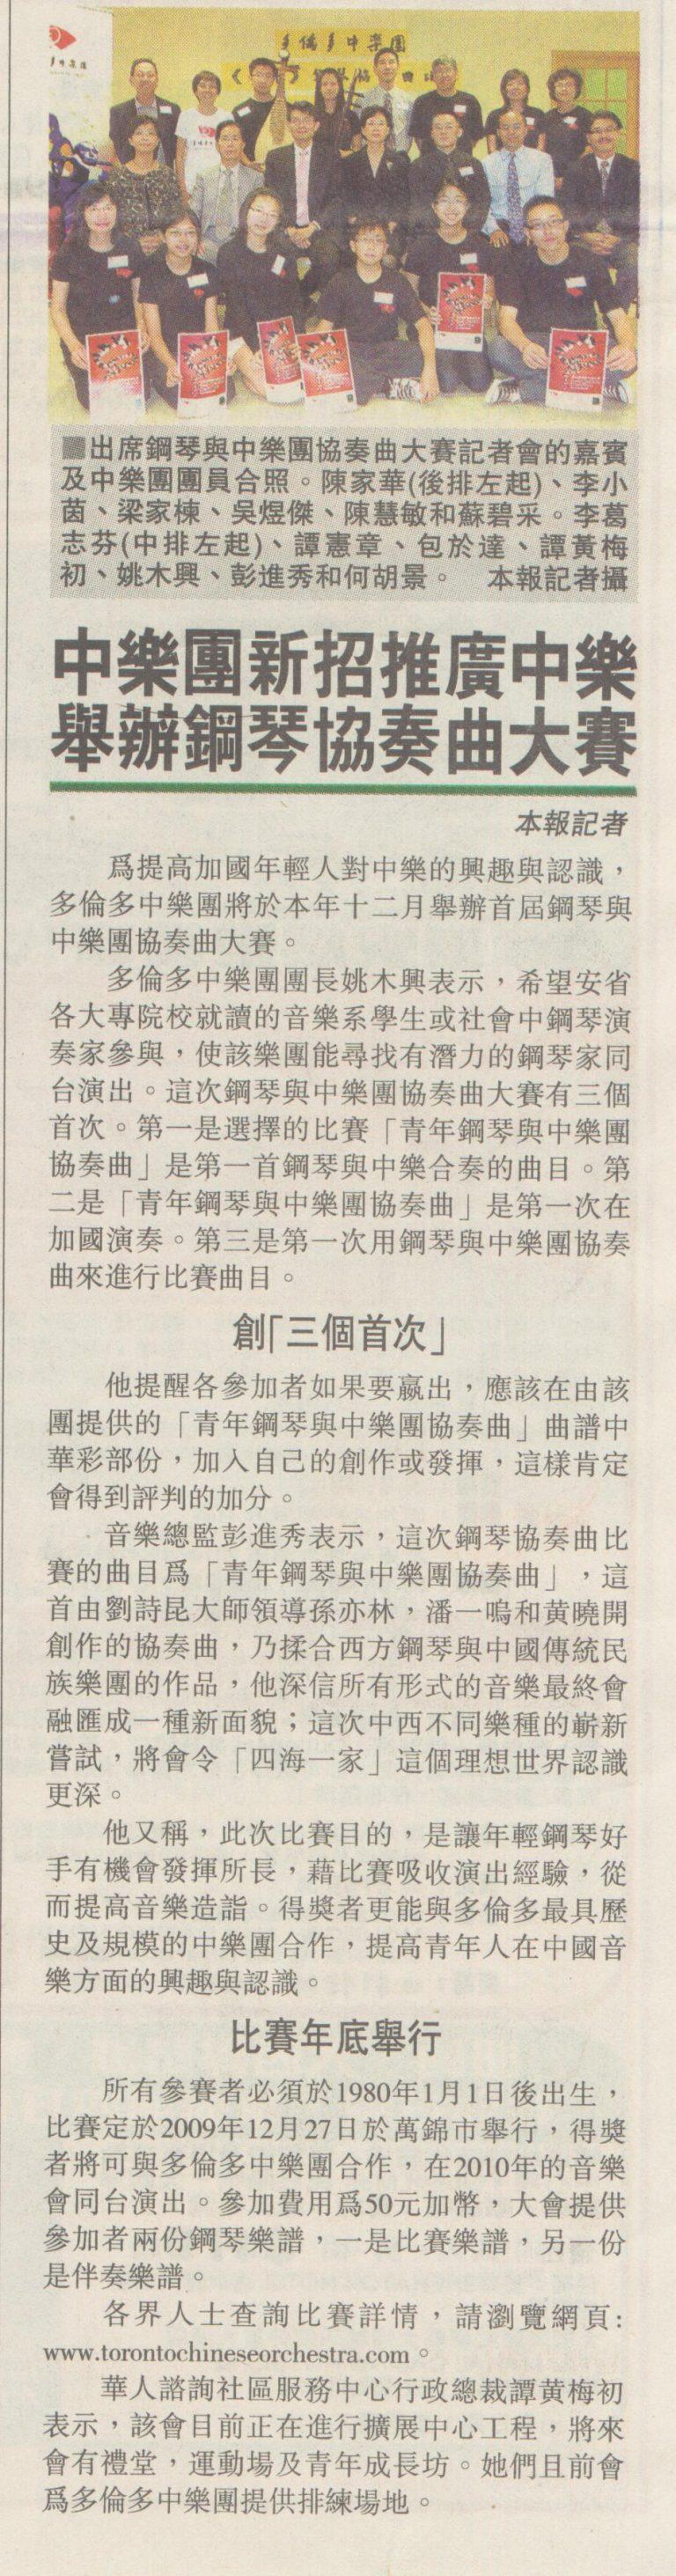 Sing Tao – Sep. 5, 2009 星島日報